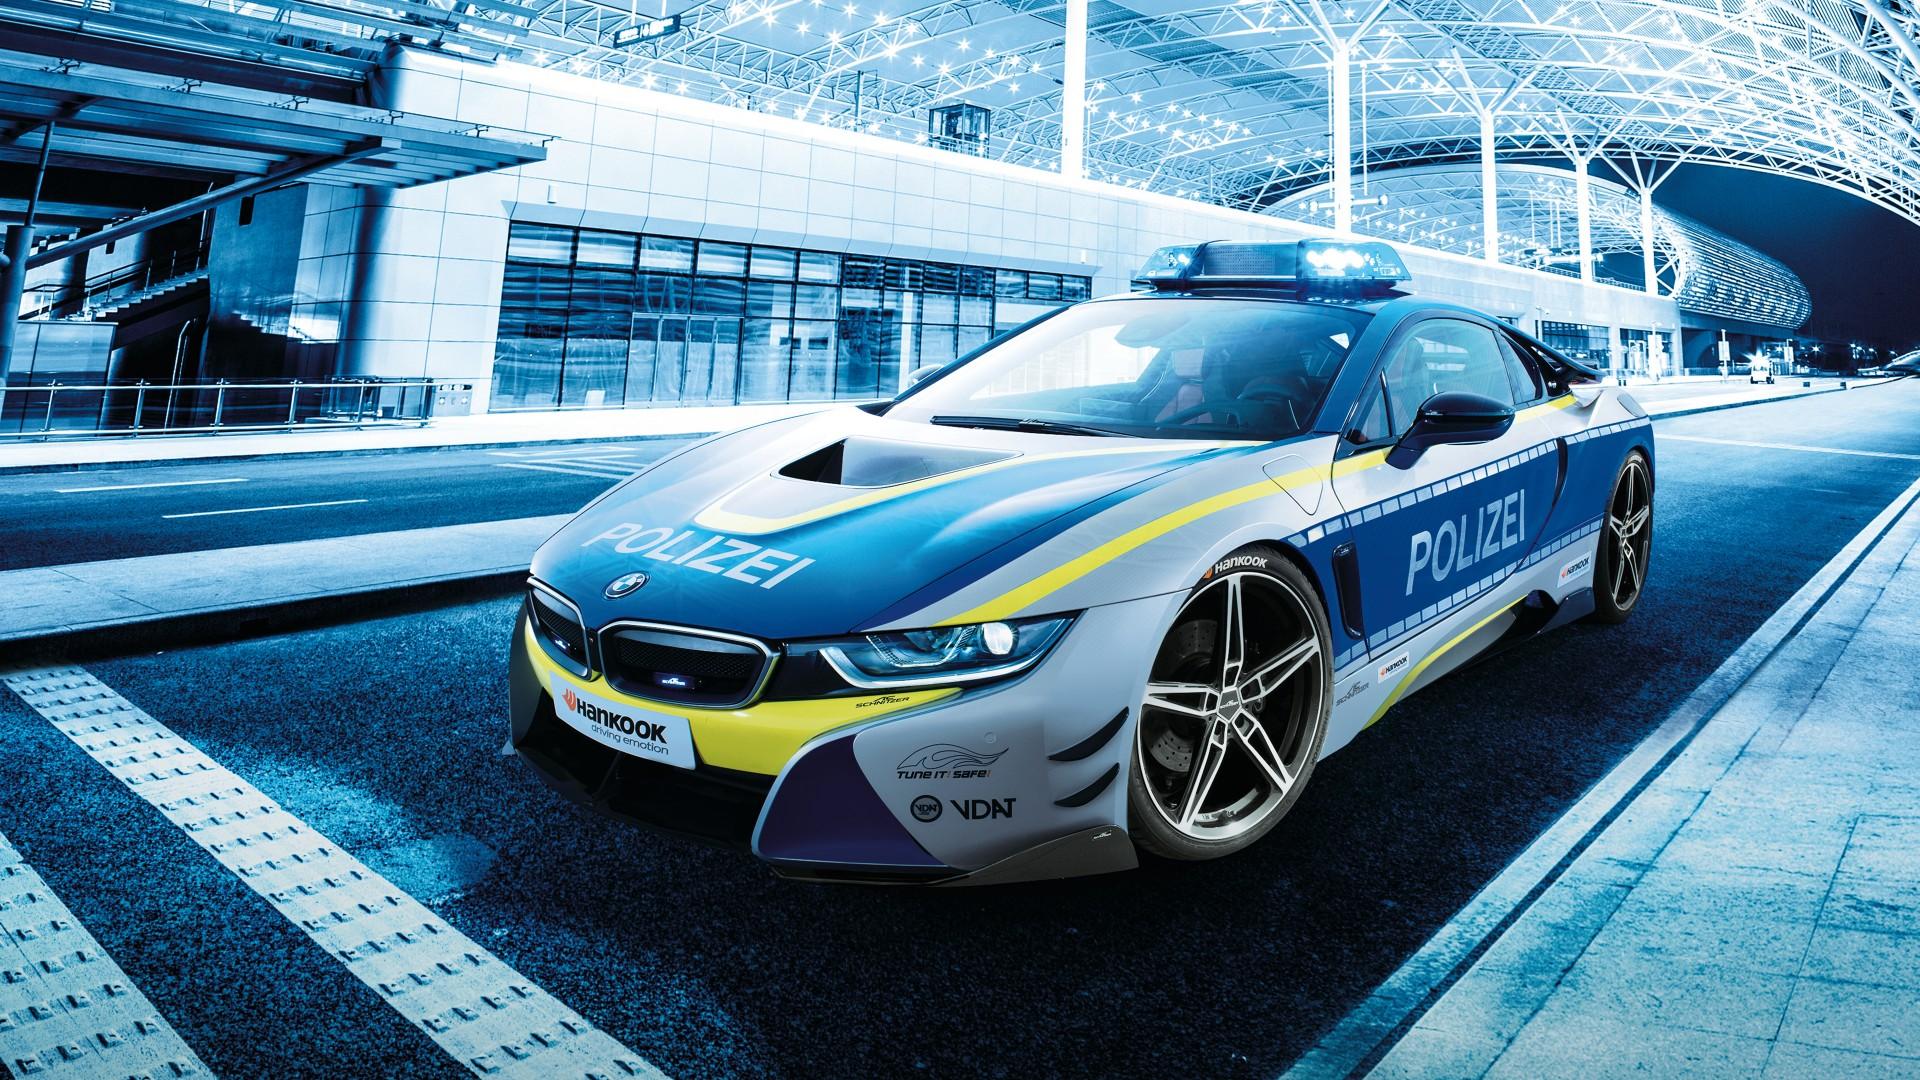 2015 BMW 750Li >> AC Schnitzer BMW i8 Polizei Tune it Safe Concept 2019 4K Wallpaper | HD Car Wallpapers | ID #11738